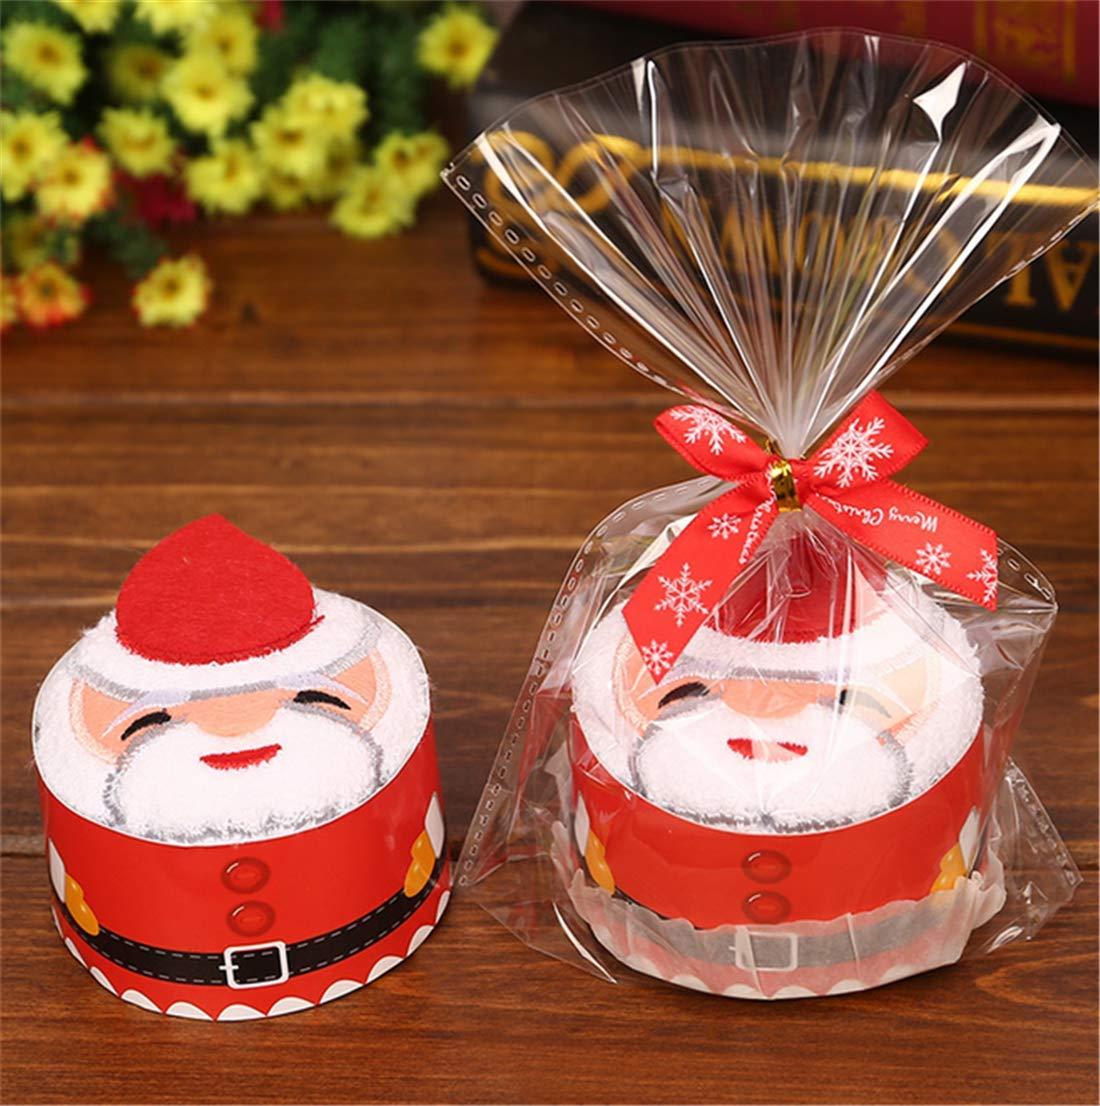 Eyiou Christmas Towel Gift Cake Modelling Cotton Towel Washcloth for Xmas Decoration Christmas Birthday Gift (Santa Claus)